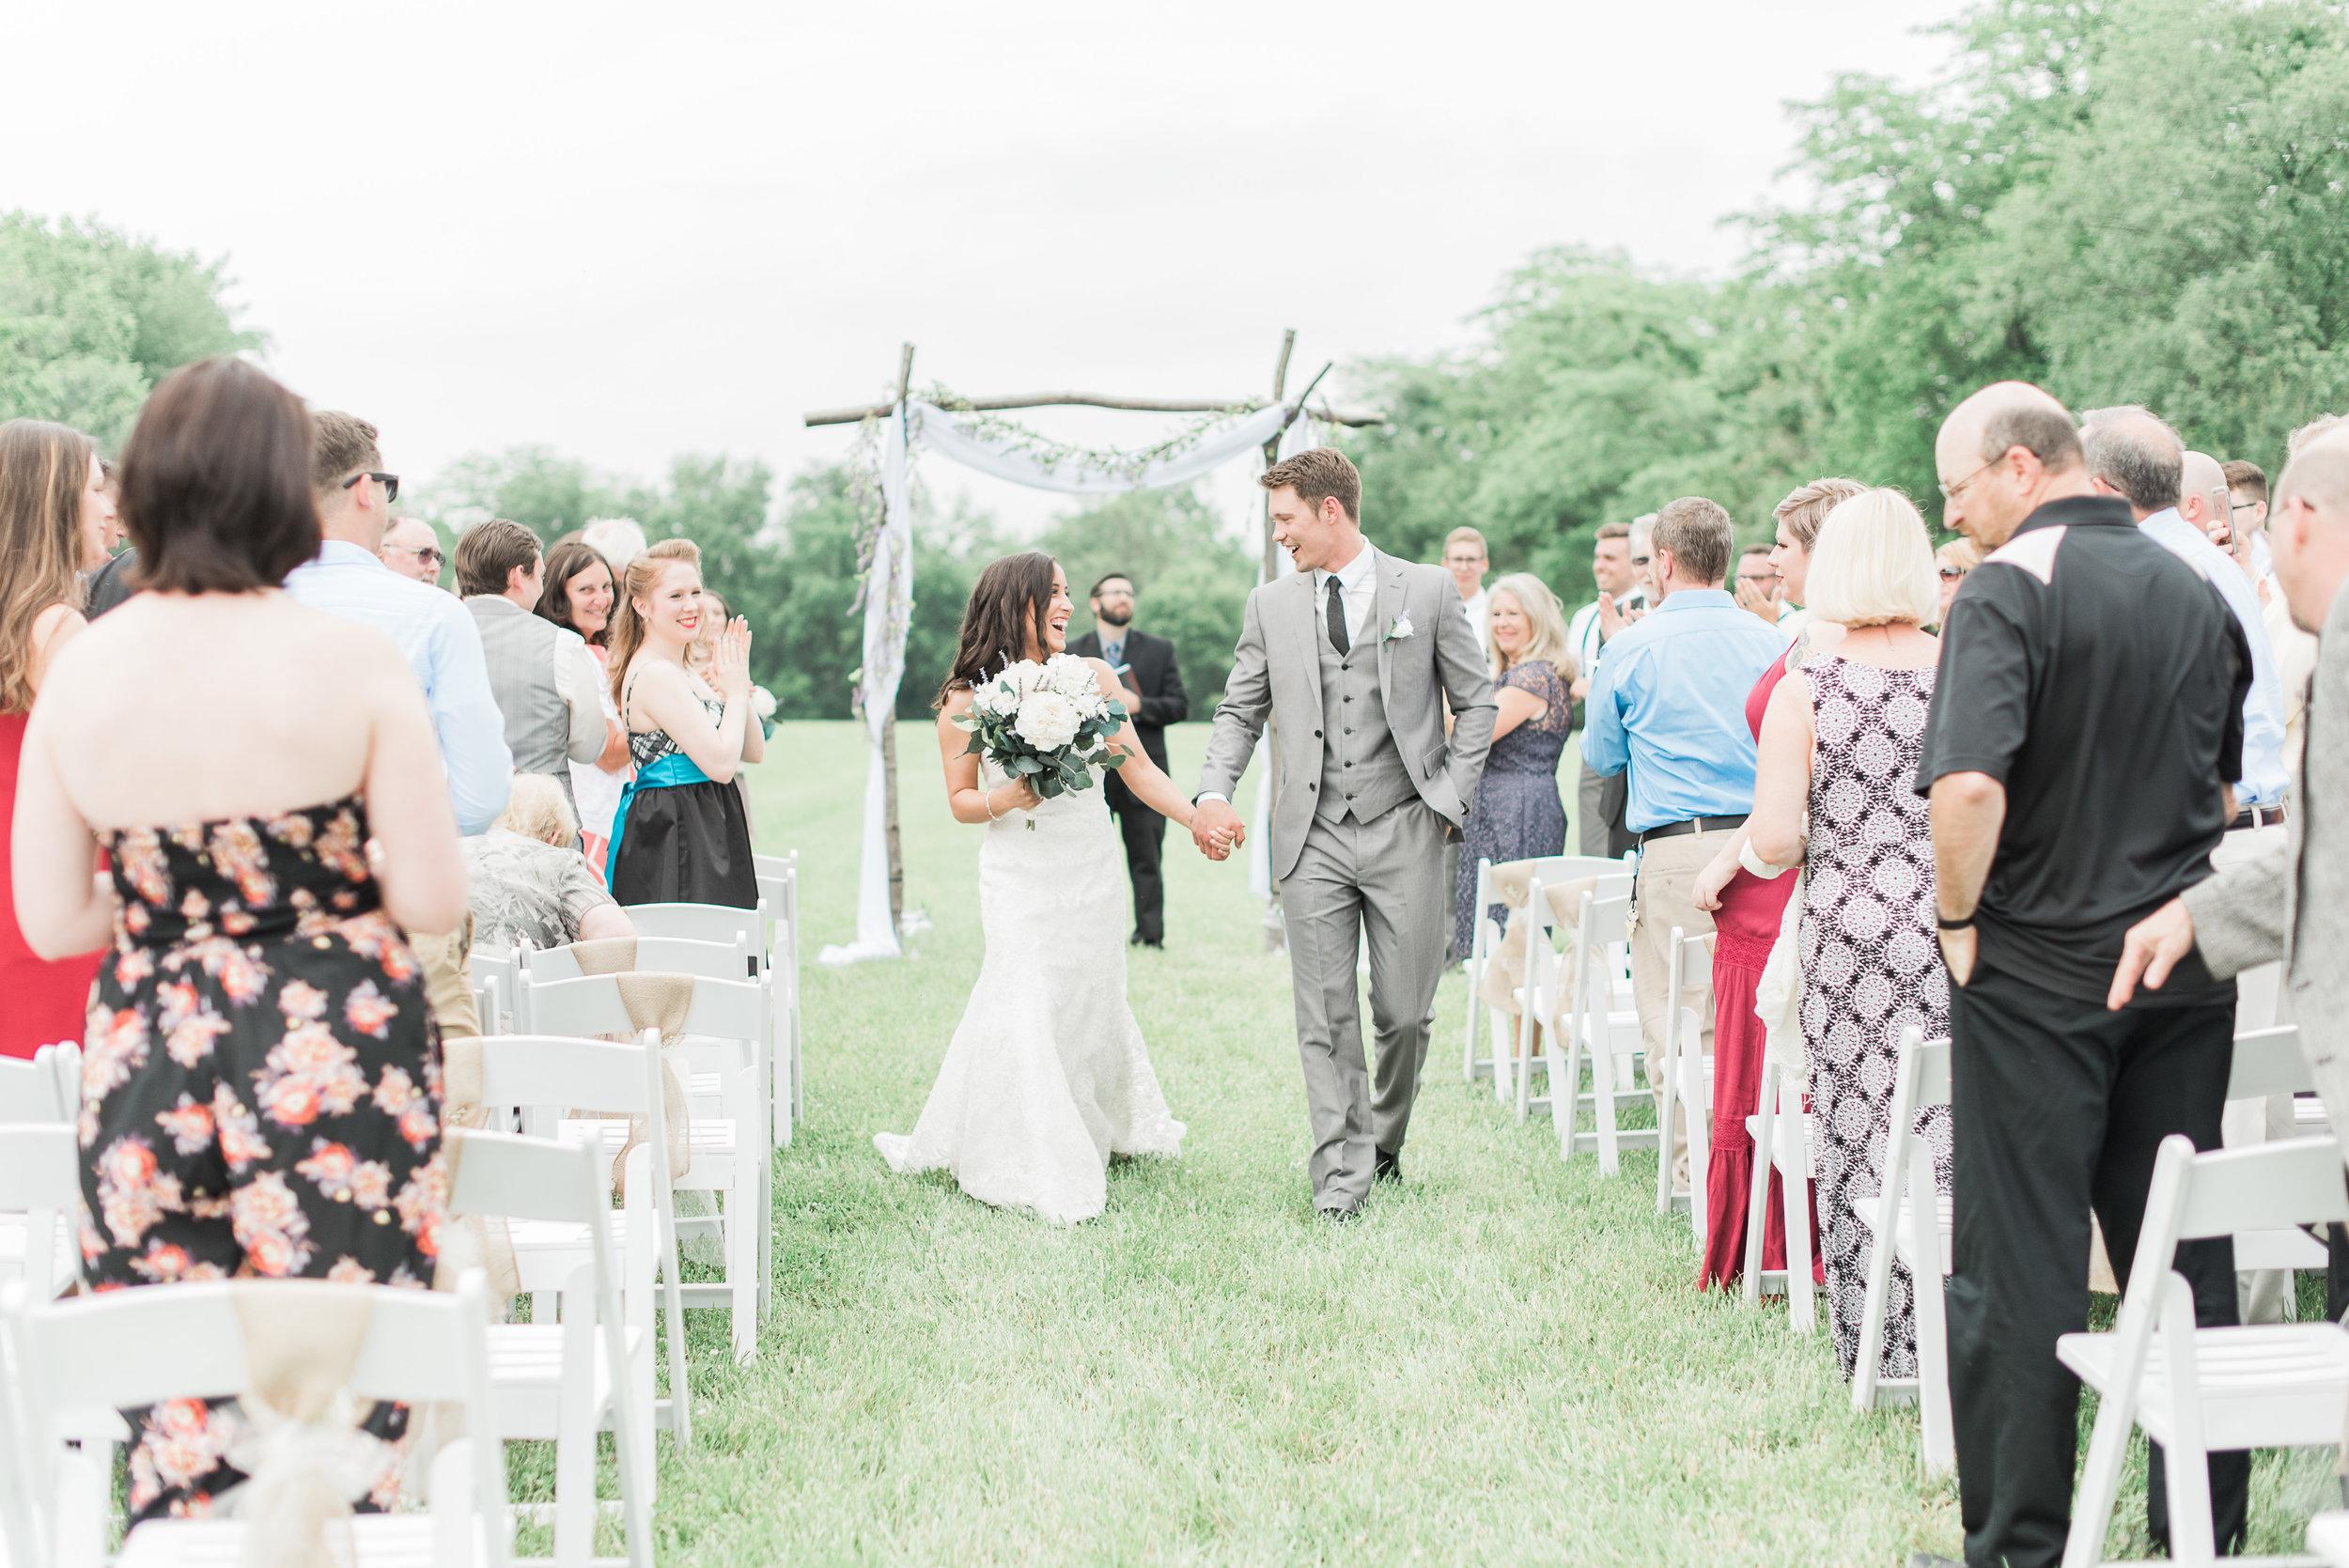 sarah-marcus-married-240 copy.jpg